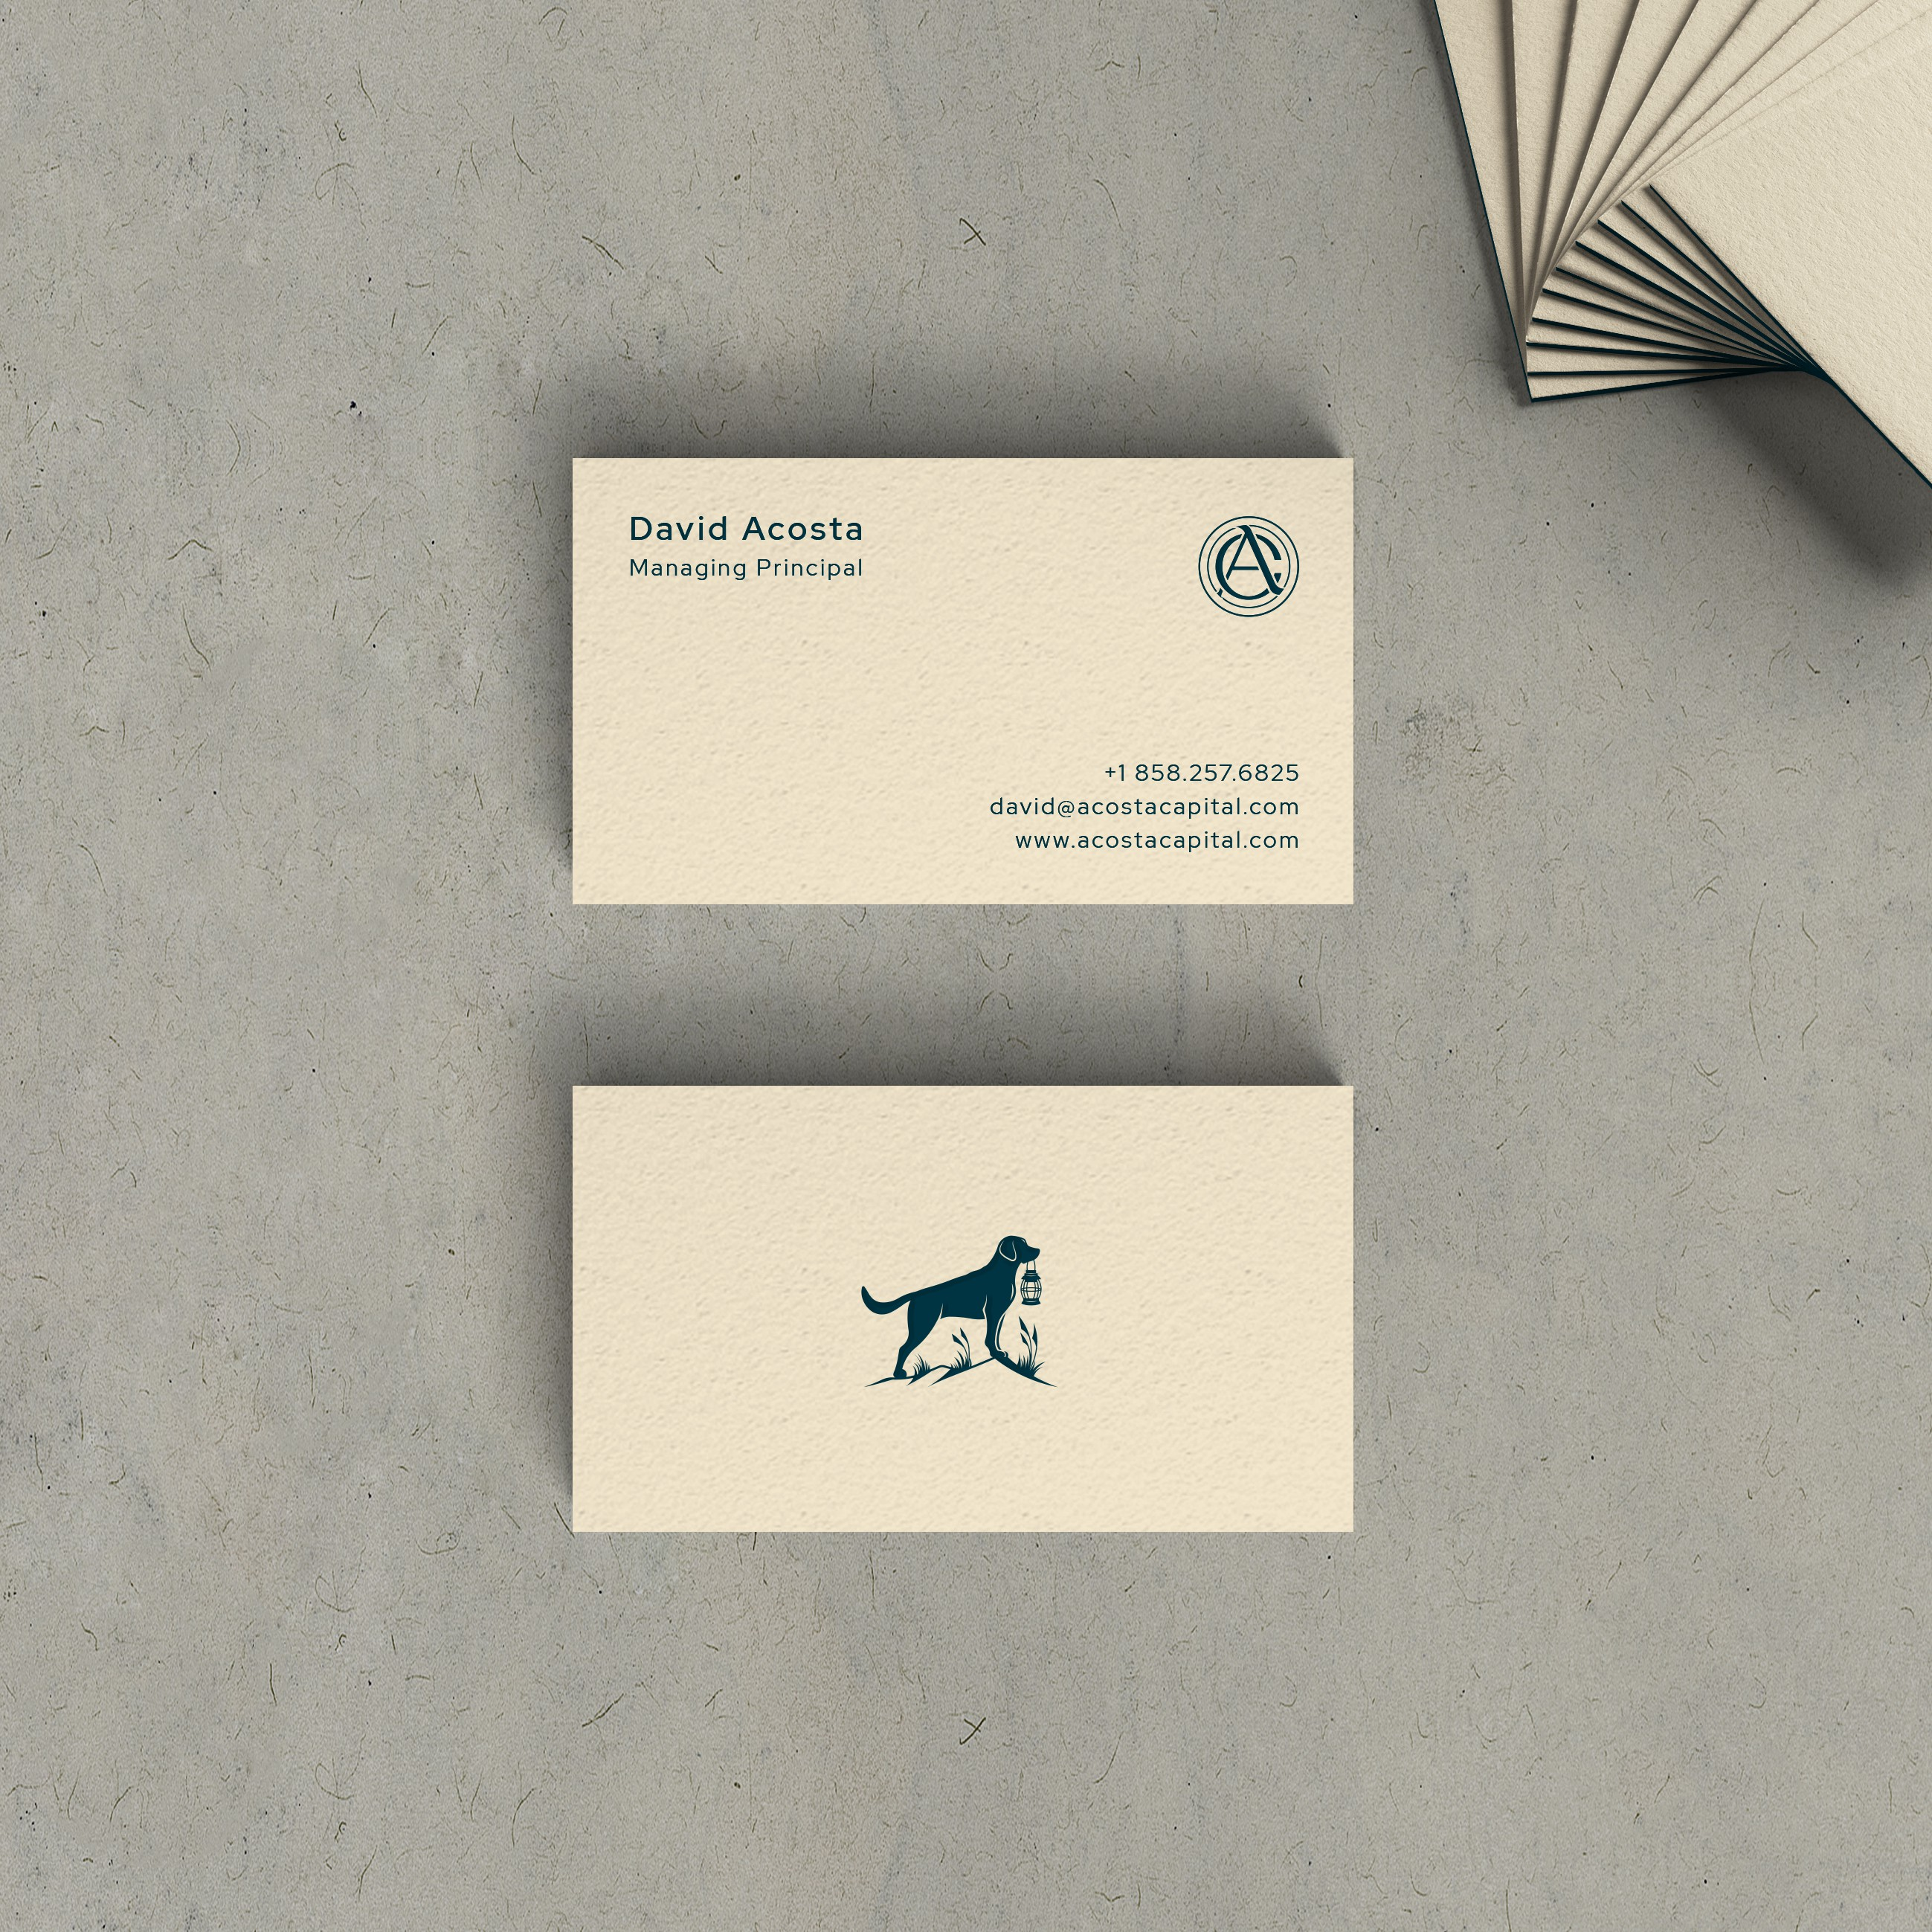 Acosta Capital - business card design